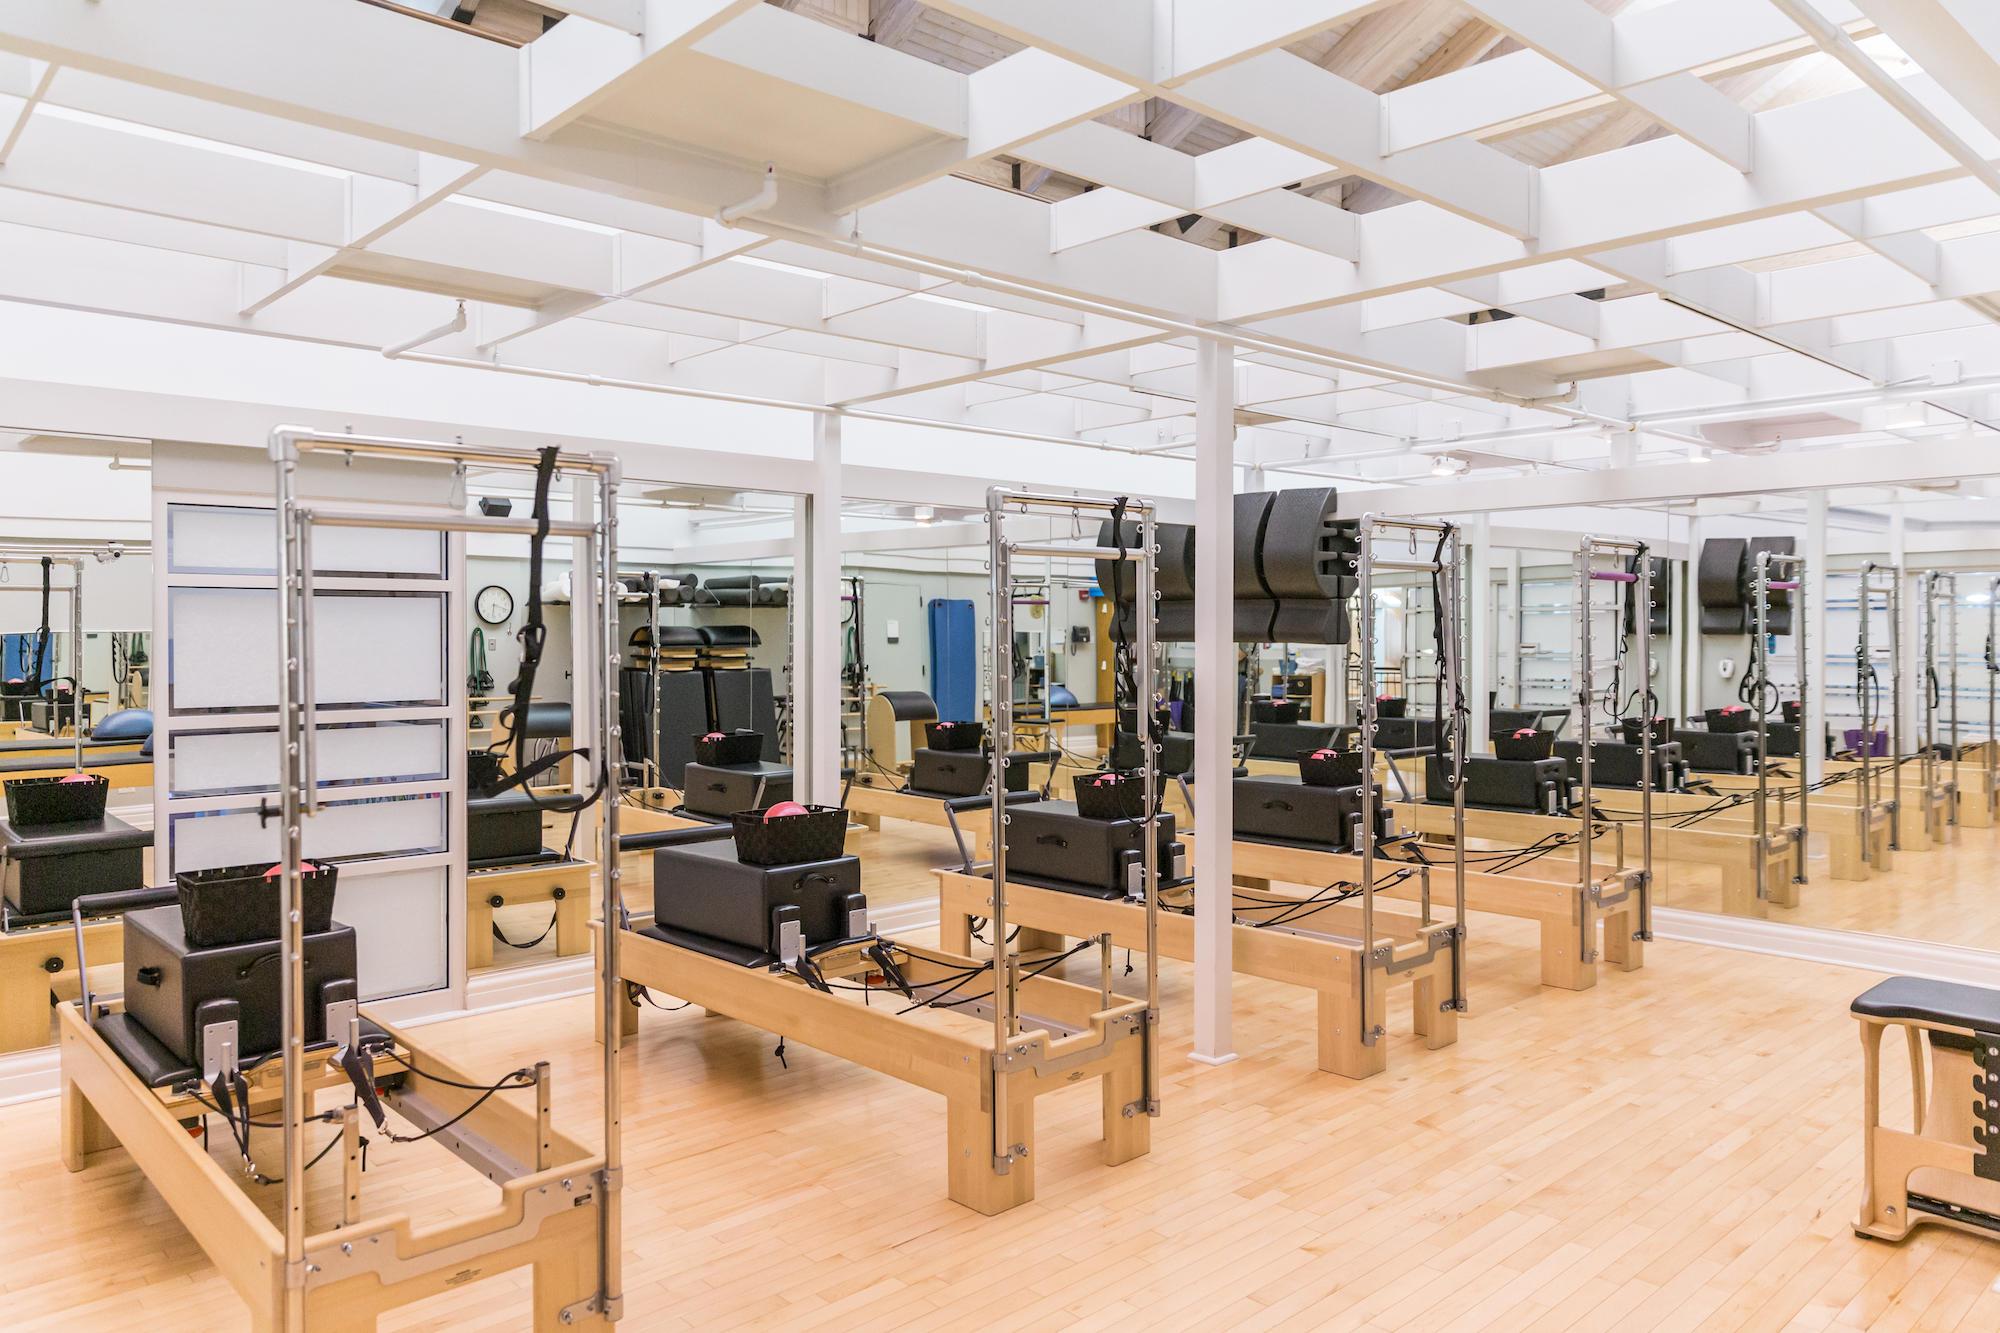 Northwestern Medicine Lake Forest Health & Fitness Center